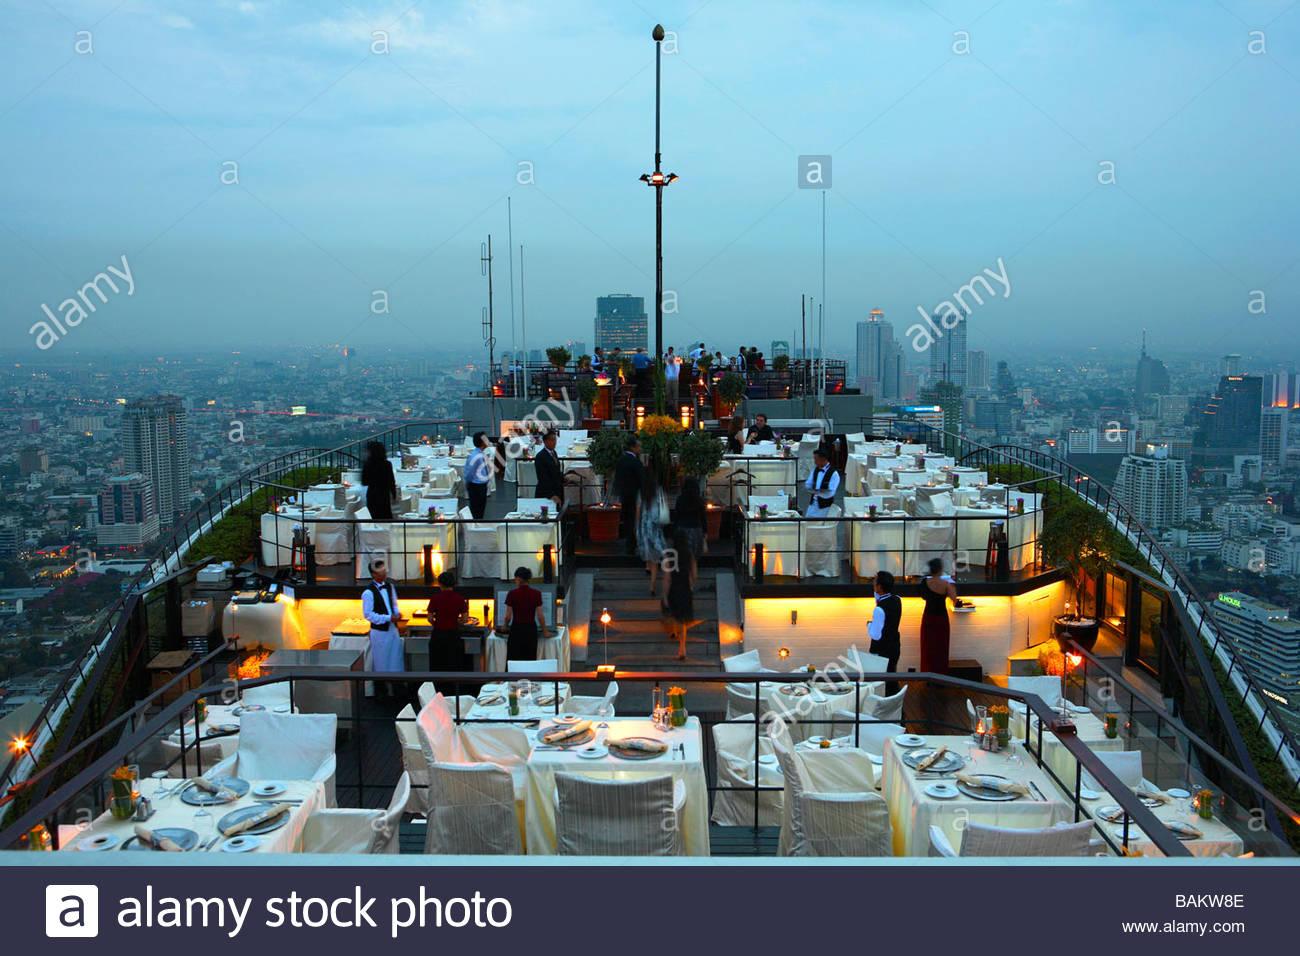 Banyan Tree Hotel, Vertigo bar and restaurant, Bangkok, Thailand - Stock Image